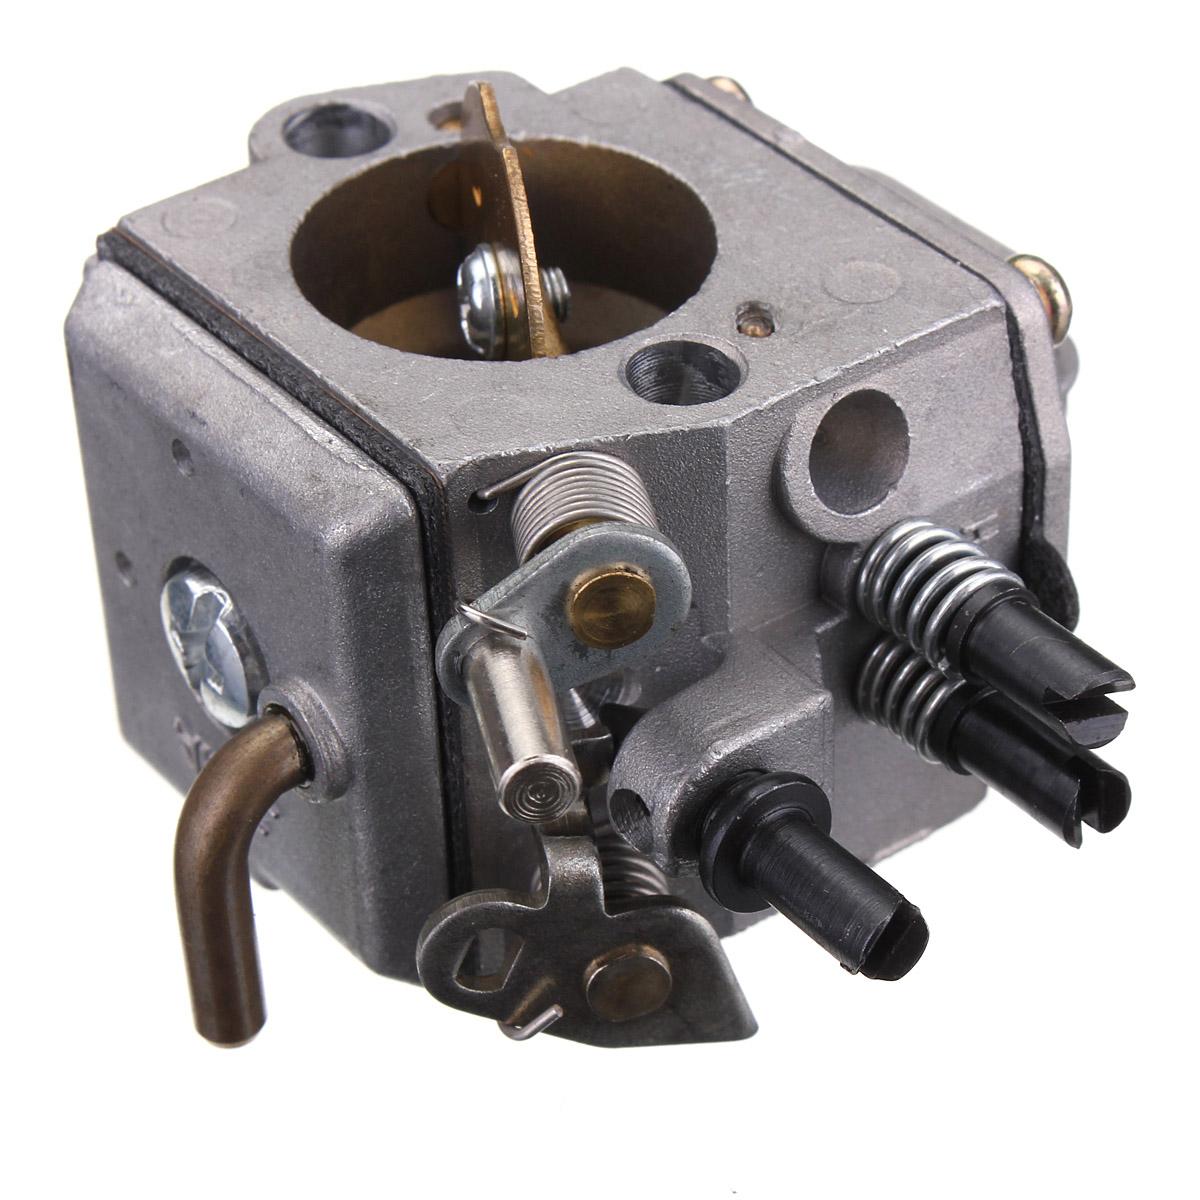 Buy Gas Chainsaw Oil Carb Carburetor For ZAMA STIHL MS440